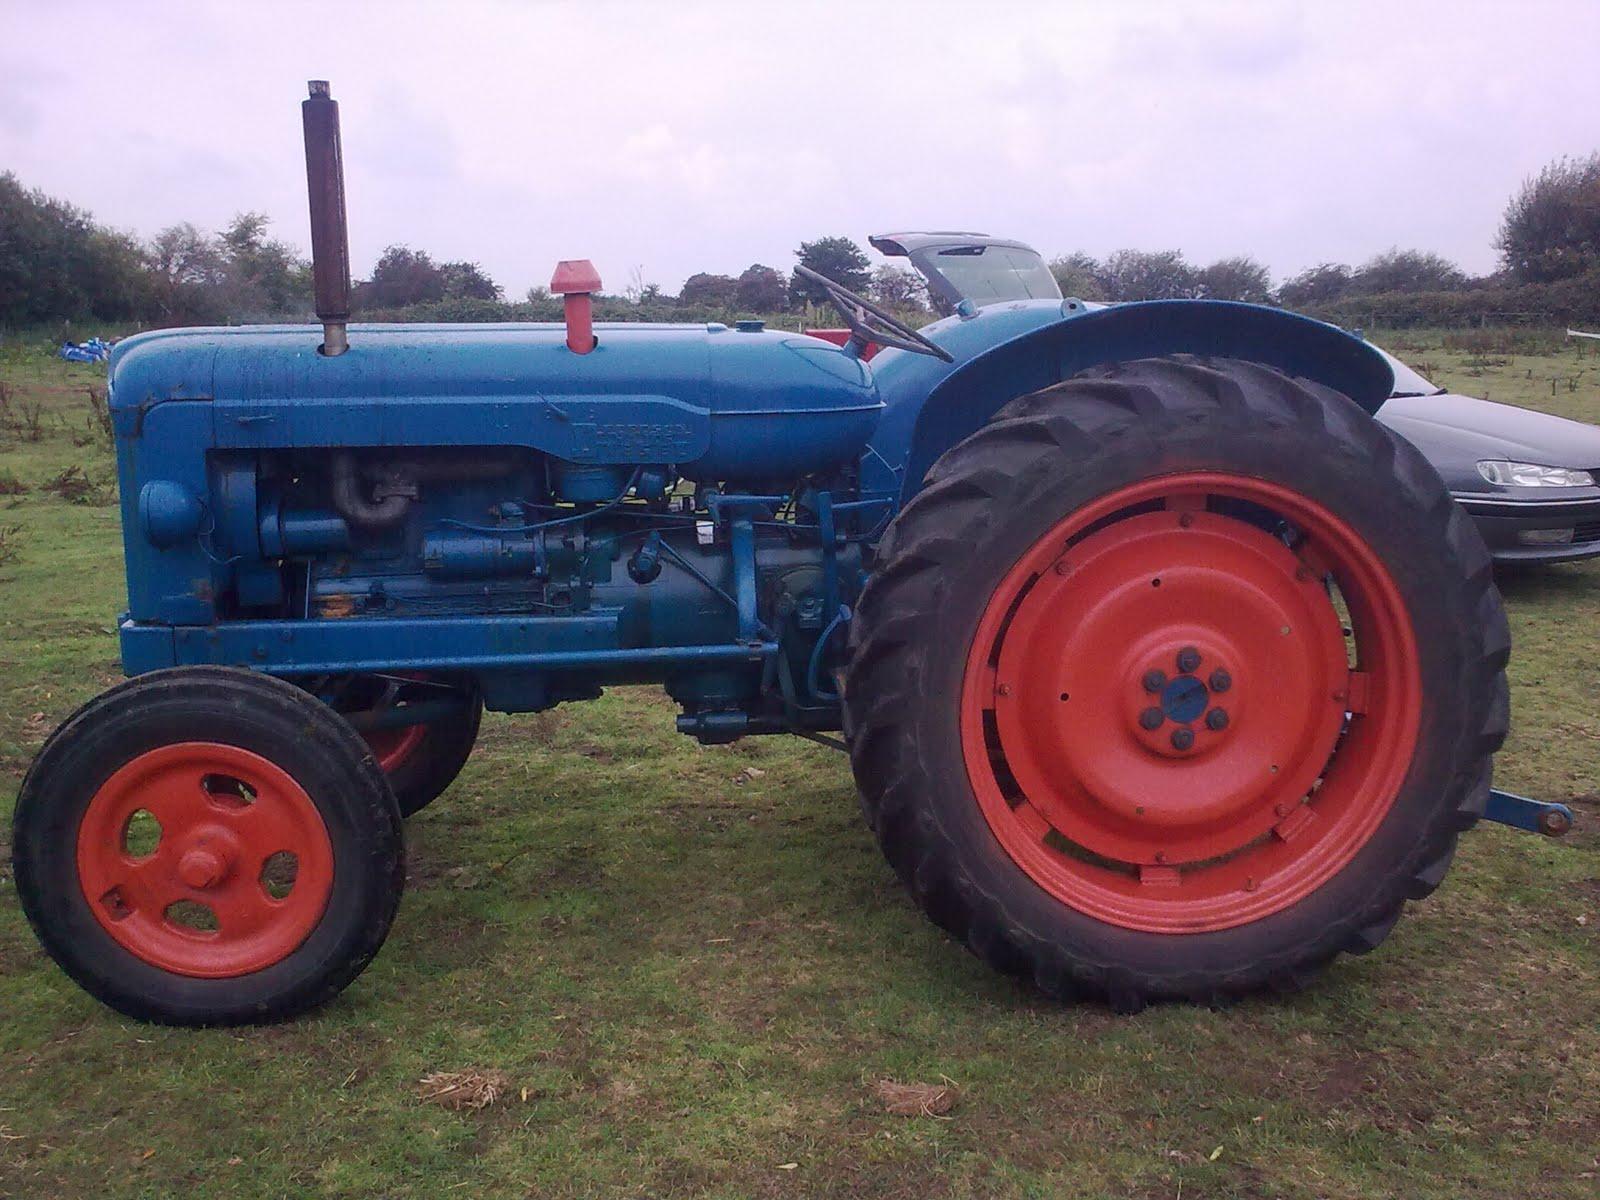 1957 Fordson Major Diesel Tractor : Jack my fordson major tractor